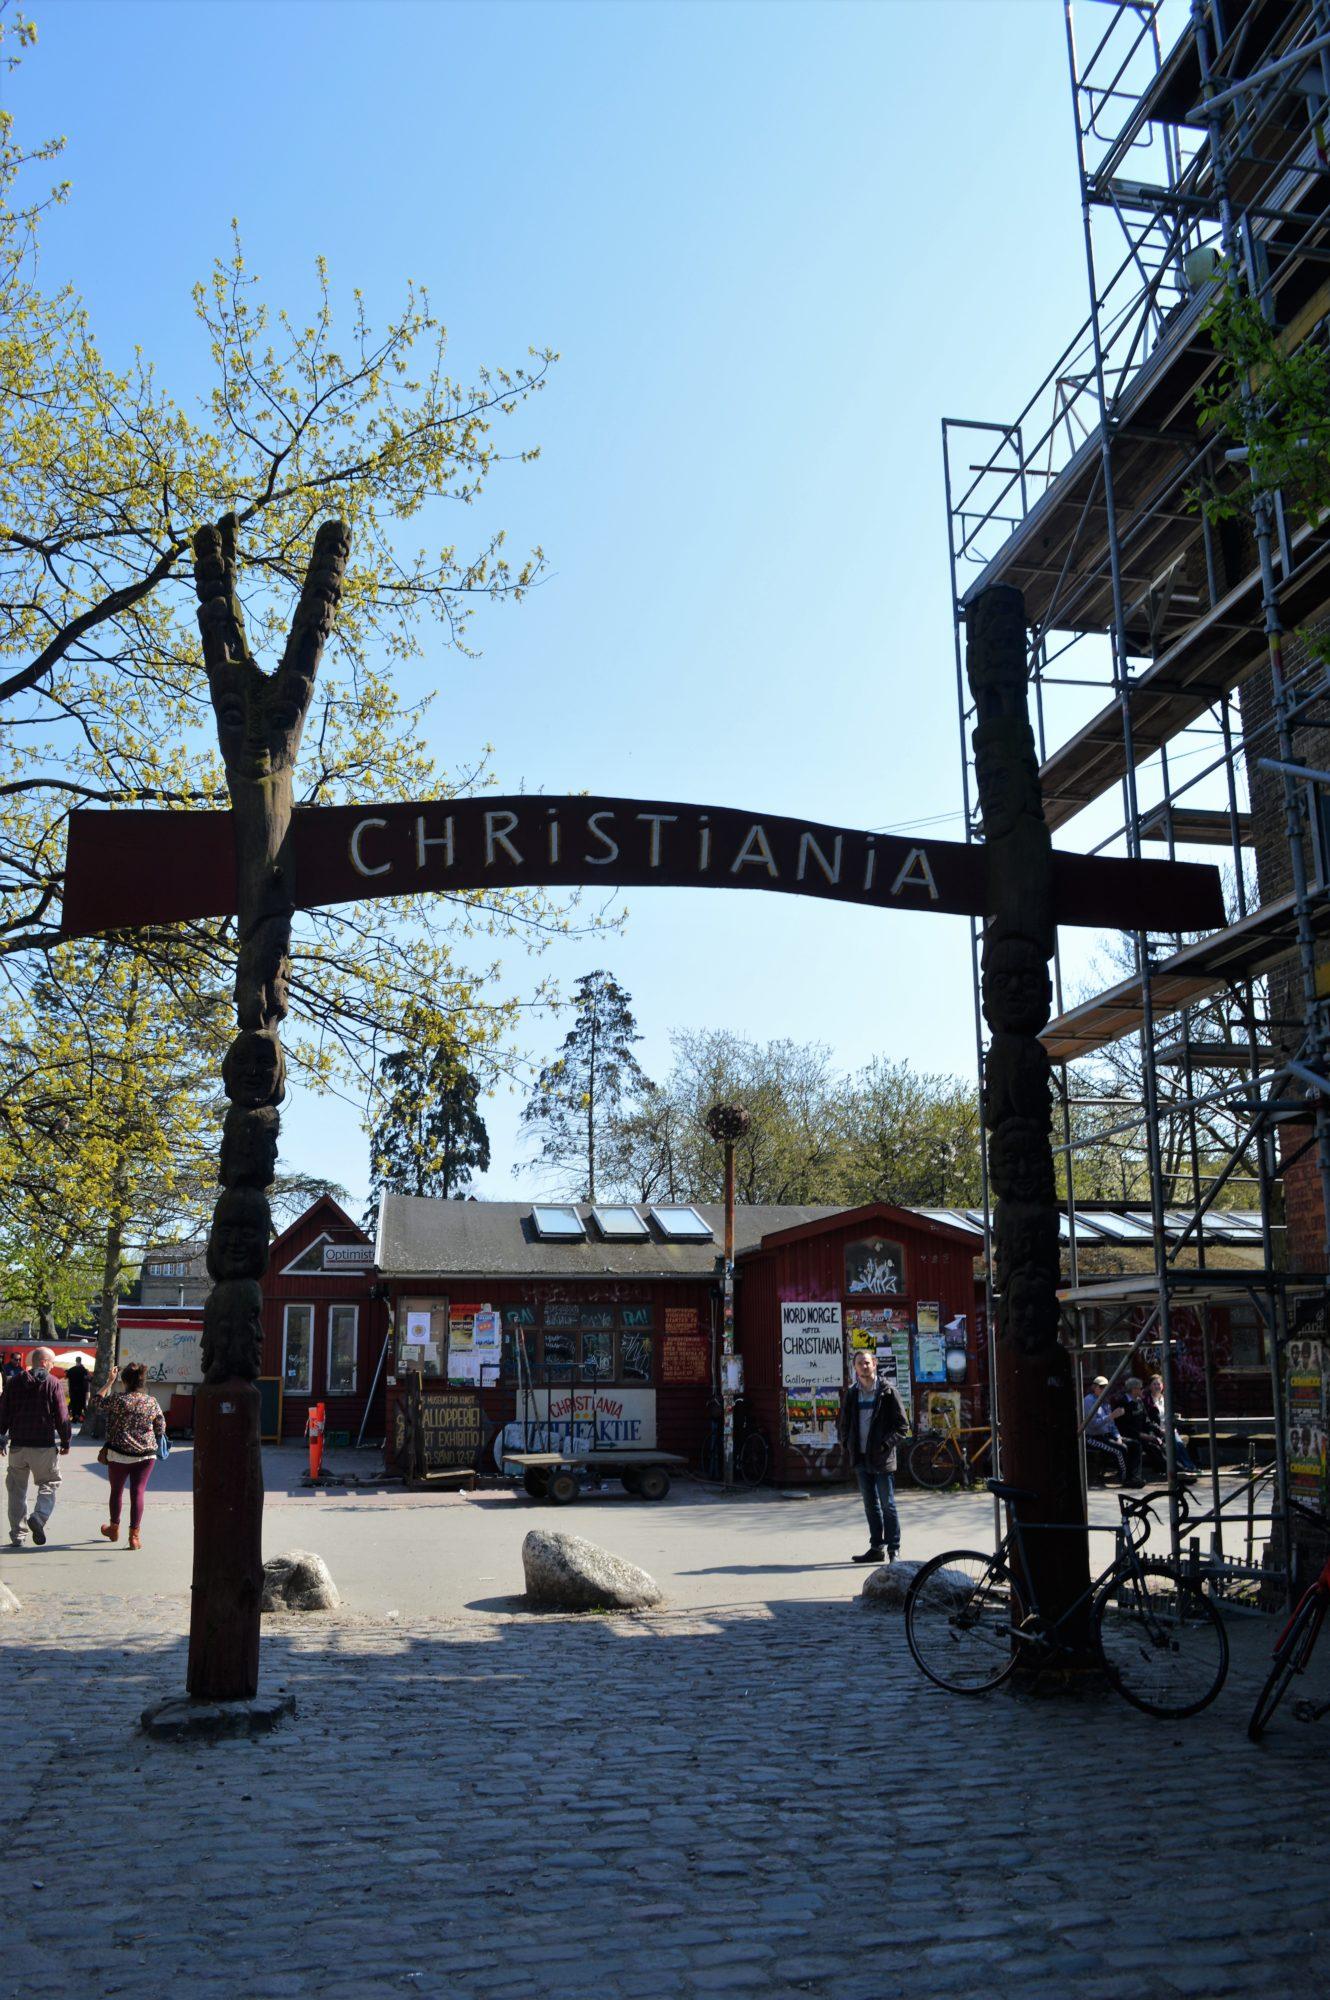 christiania-copenhagen